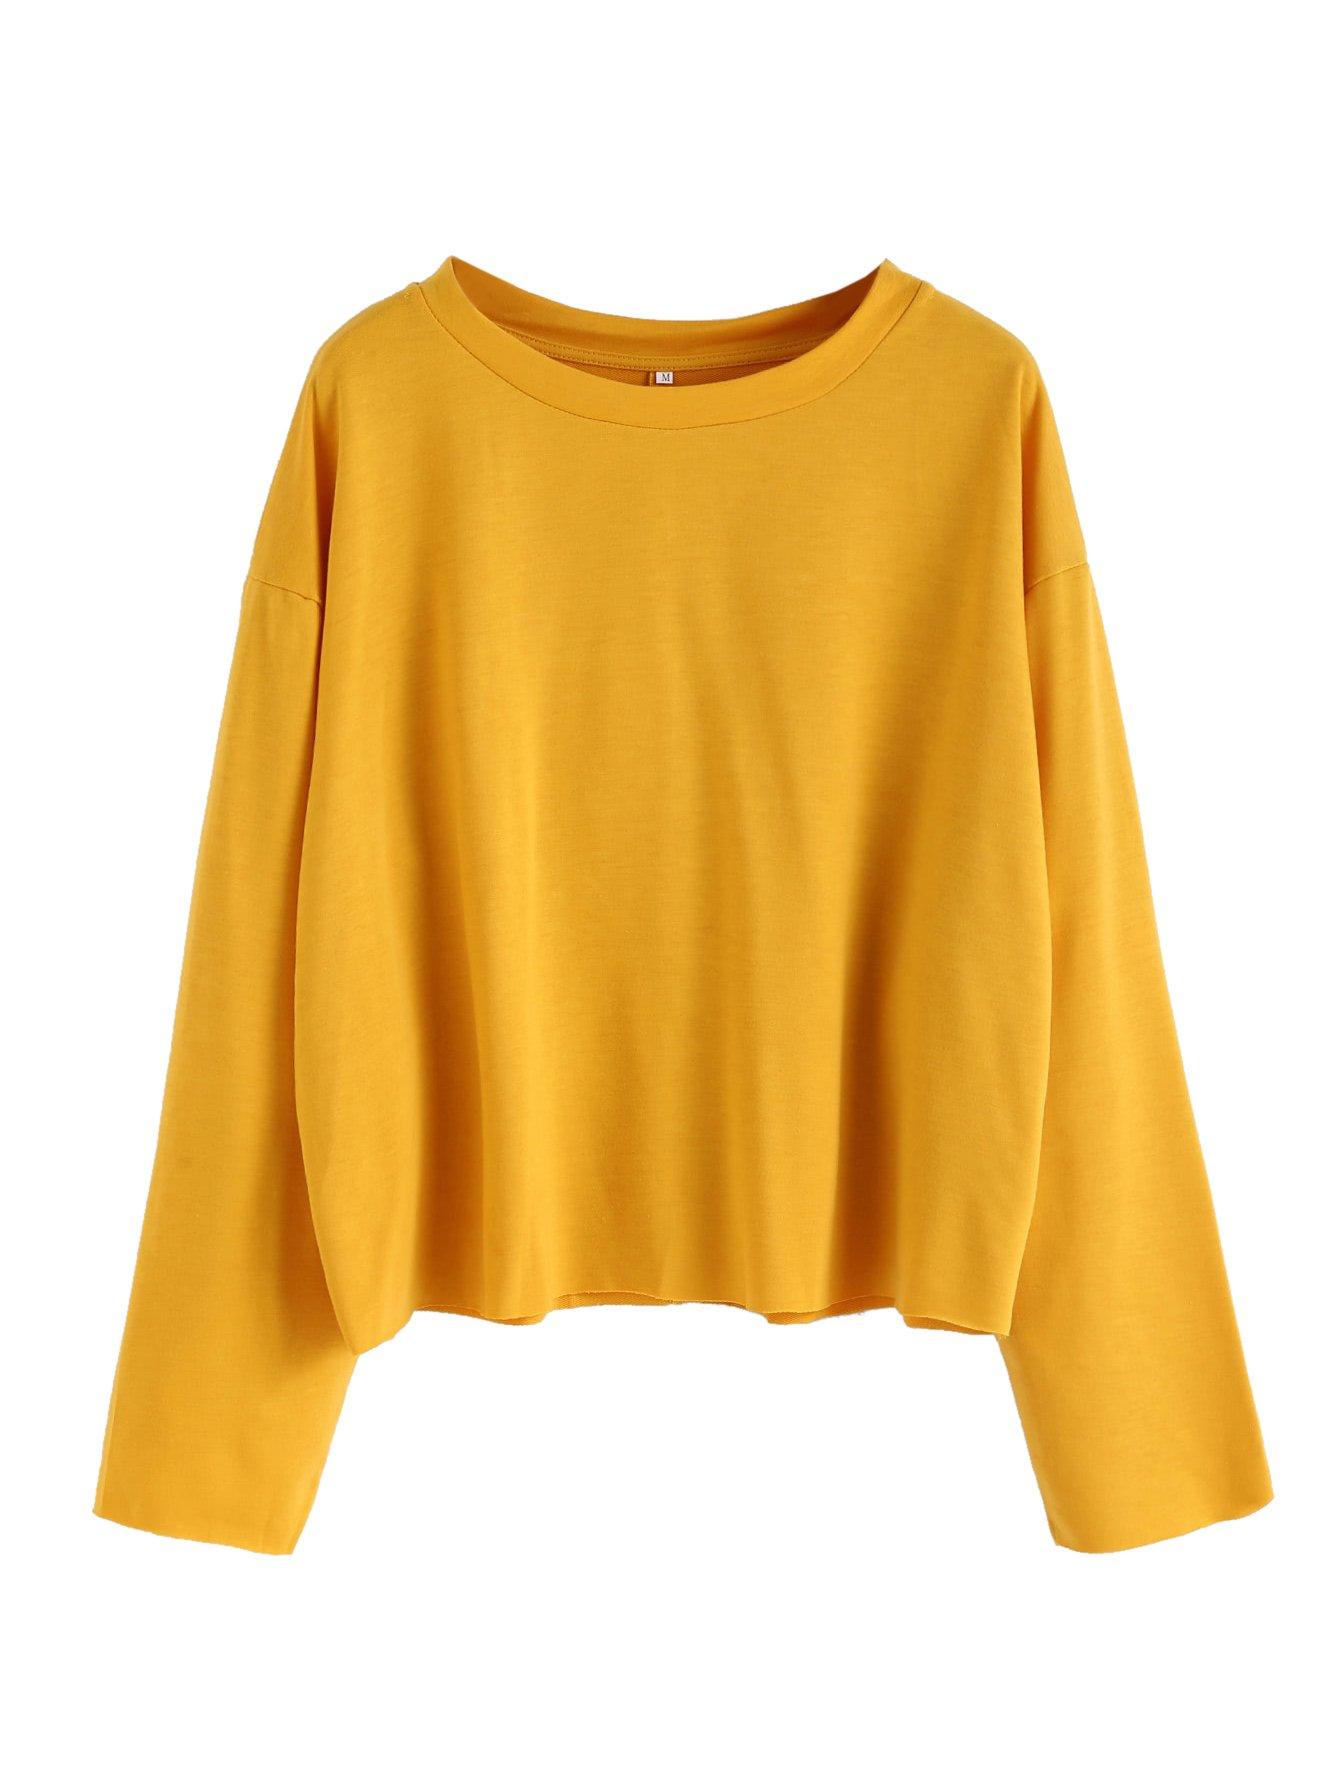 SweatyRocks Women's Casual Long sleeve Tops Raw Cut Pullover Sweatshirt Yellow M